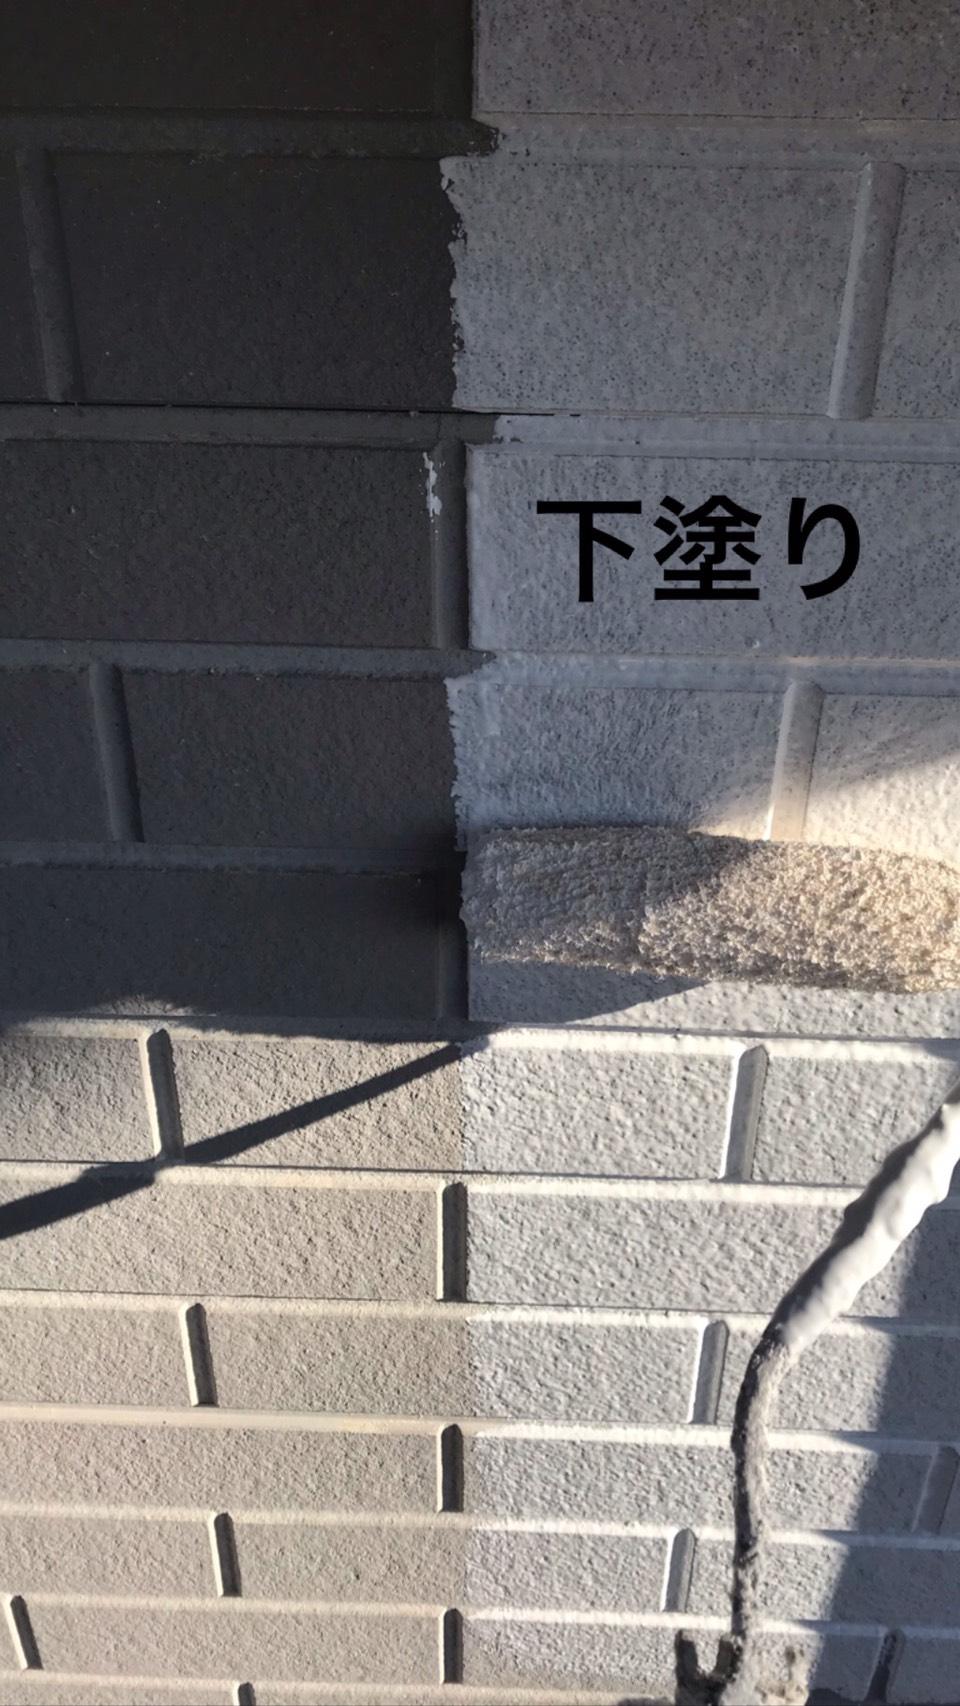 勝浦市O様邸屋根葺き替え、外壁塗装工事